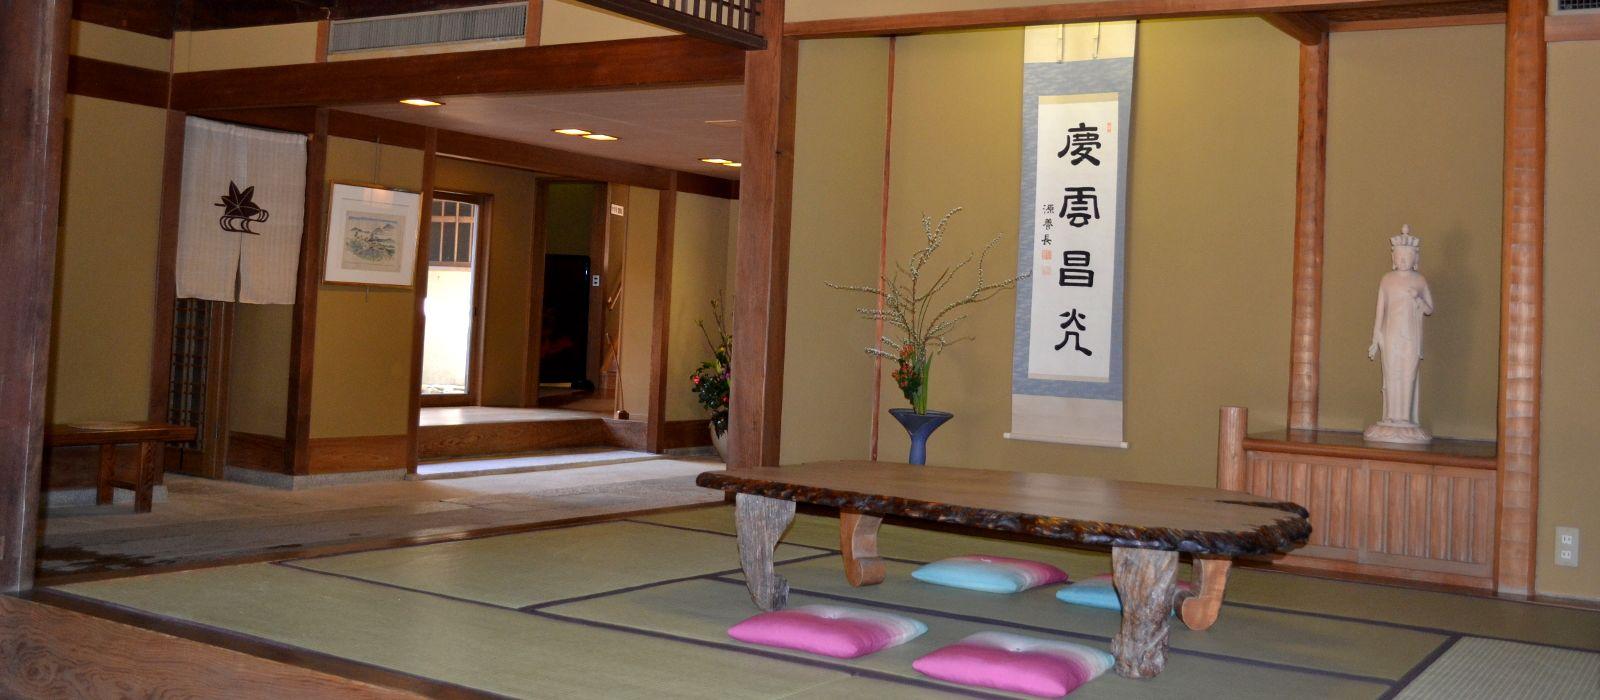 Hotel Iwaso Miyajima Ryokan Japan